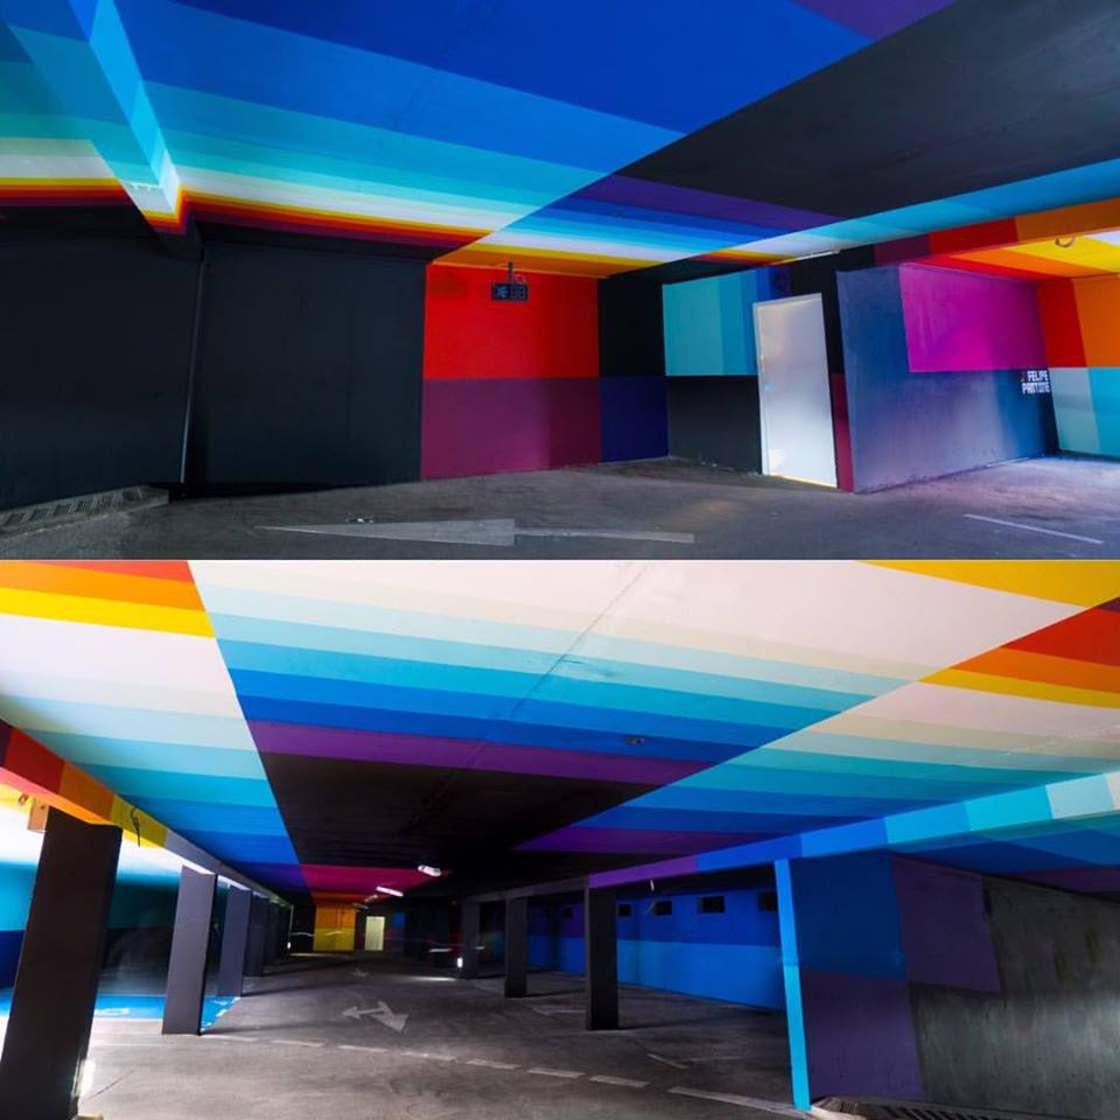 2KM3 - A car park transformed into a gigantic street art museum